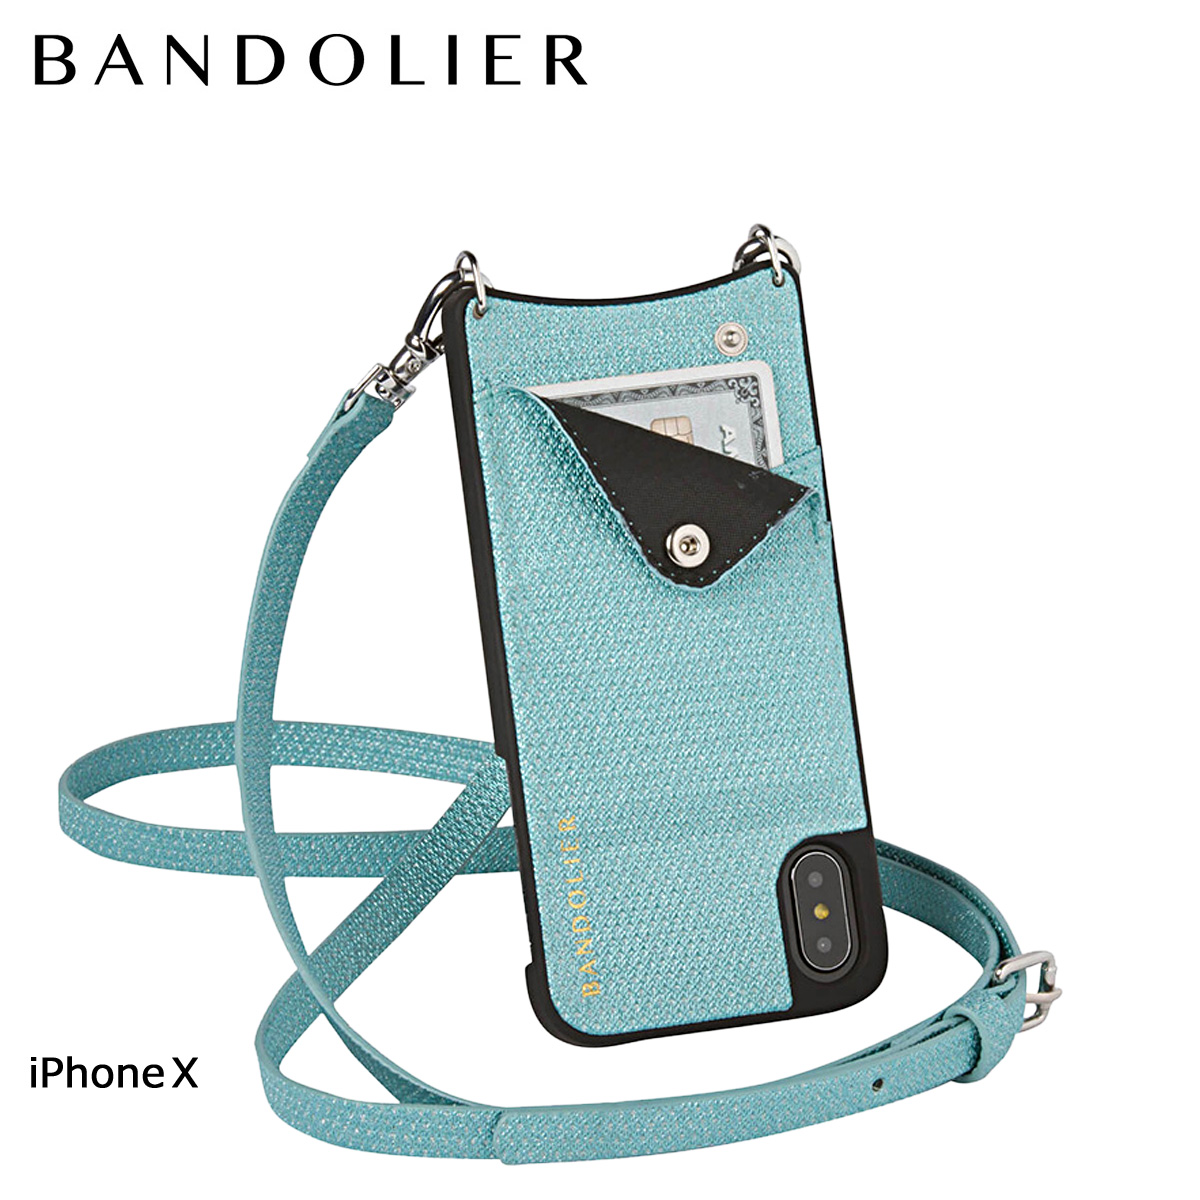 BANDOLIER バンドリヤー iPhoneX ケース スマホ アイフォン EMMA GREEN SPARKLE レザー メンズ レディース [6/1 新入荷] 【決算セール 返品不可】, 厚真町:00233531 --- pascalcaffet.jp